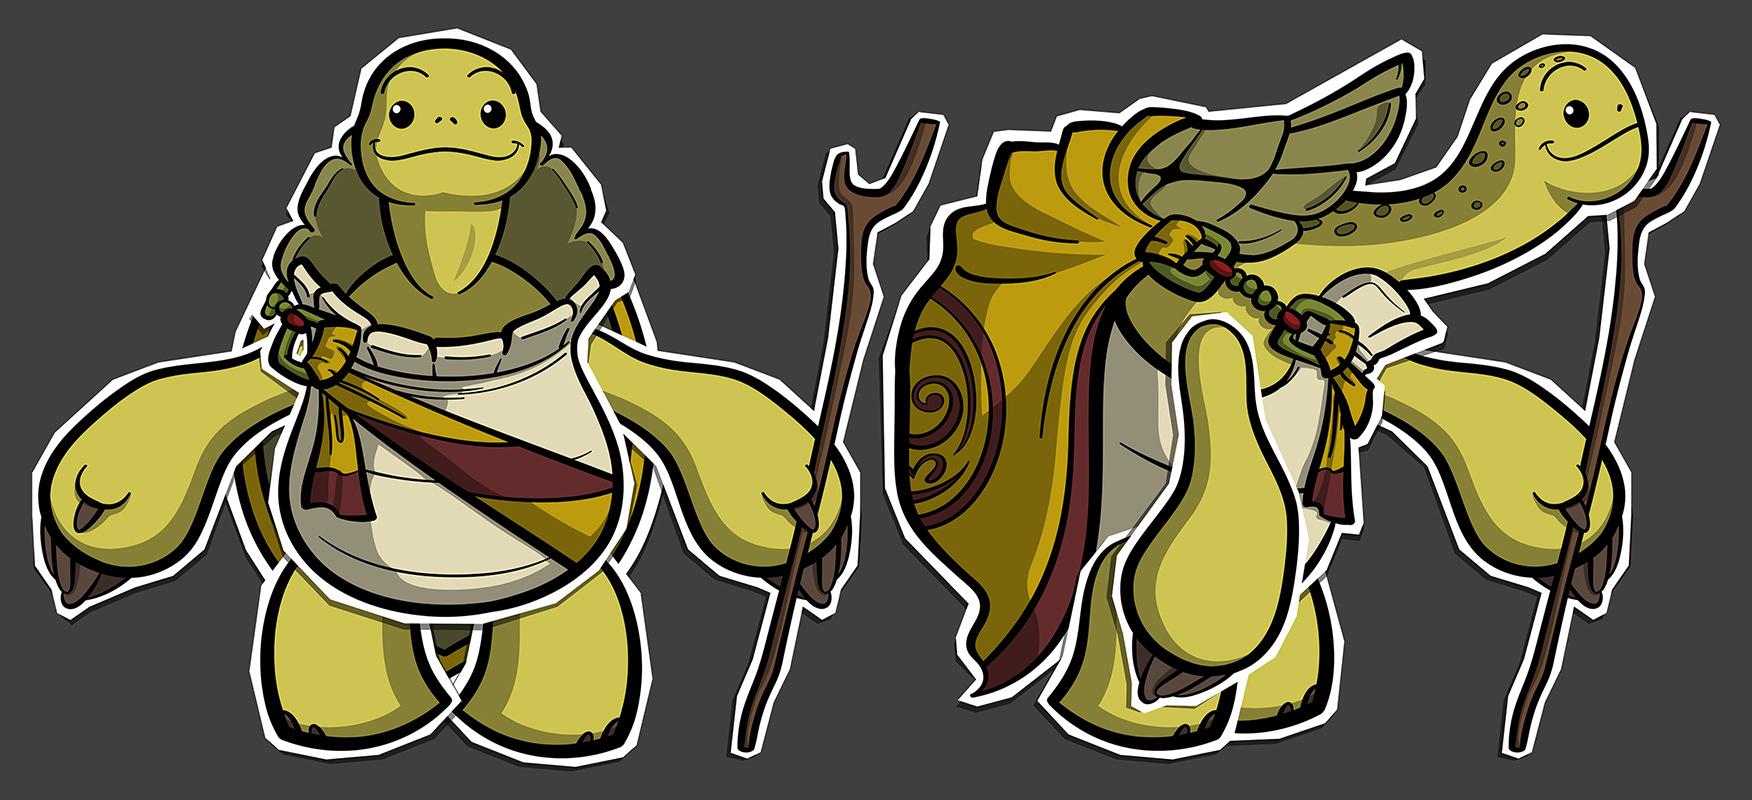 KUNGFUPANDA-Characters-2.jpg